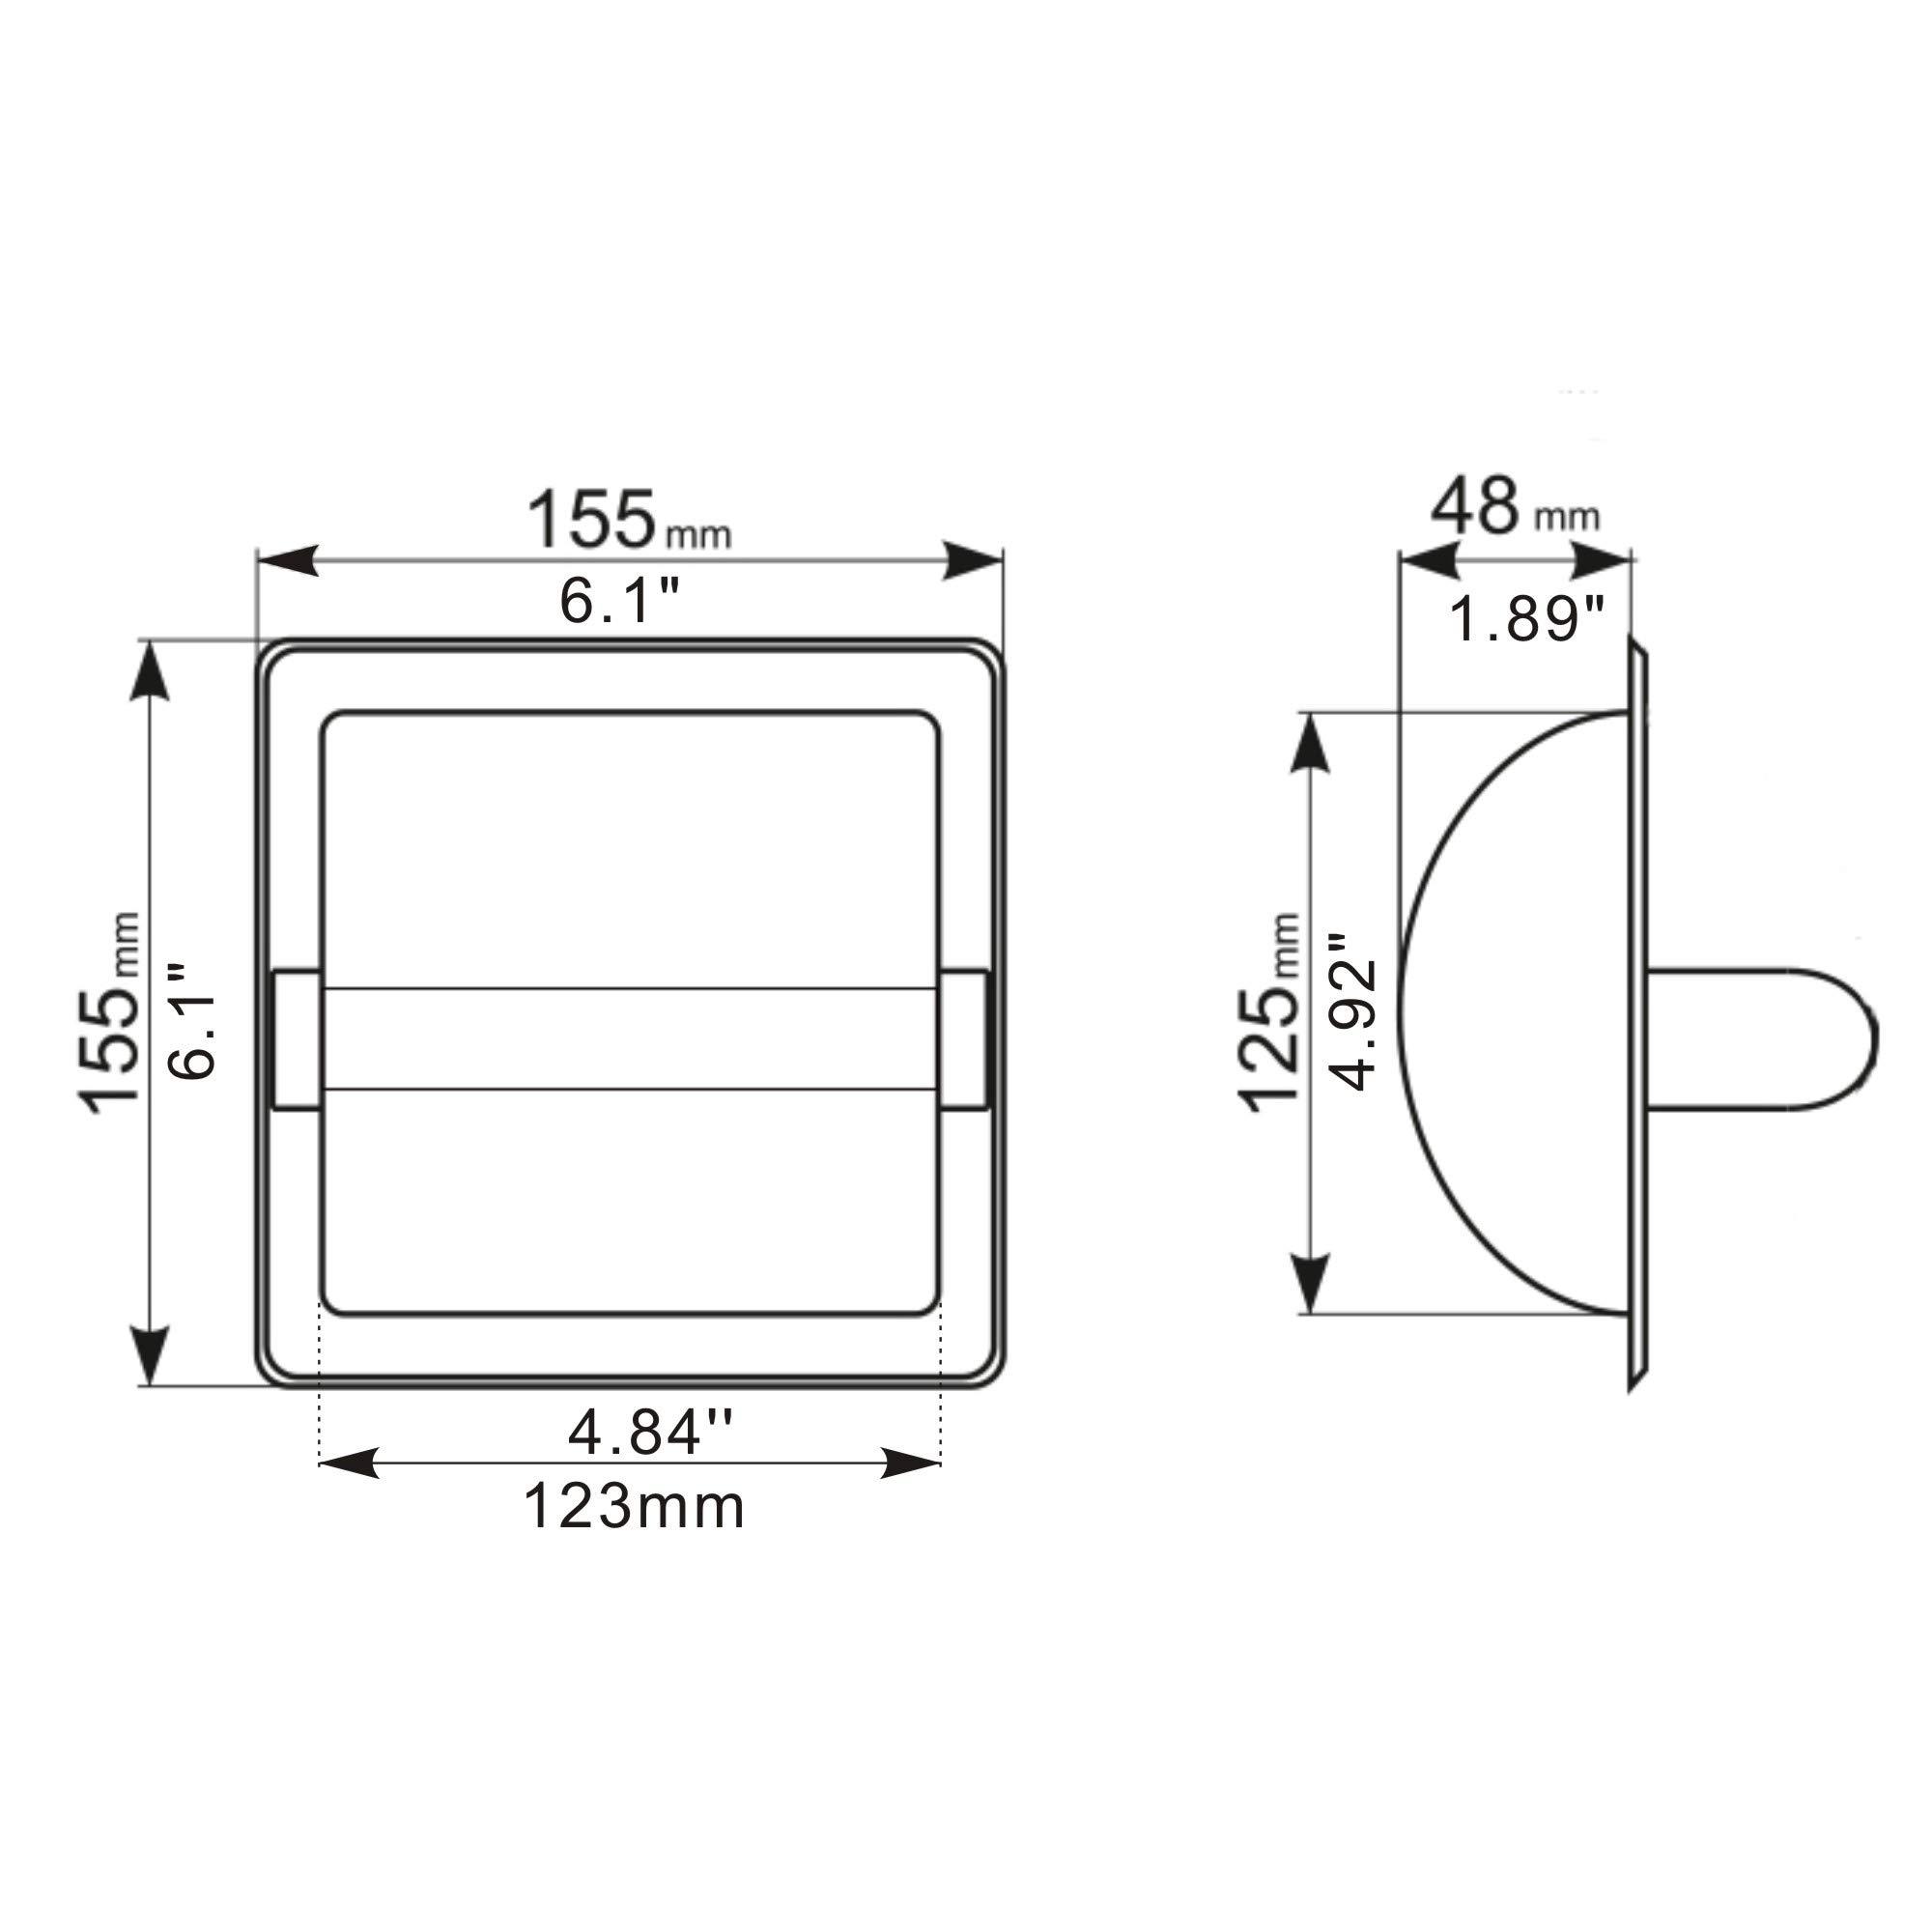 JunSun Brushed Nickel Recessed Toilet Paper Holder Wall Toilet Paper Holder Recessed Toilet Tissue Holder Stainless Steel Toilet Paper Holder Rear Mounting Bracket Included by JunSun (Image #3)